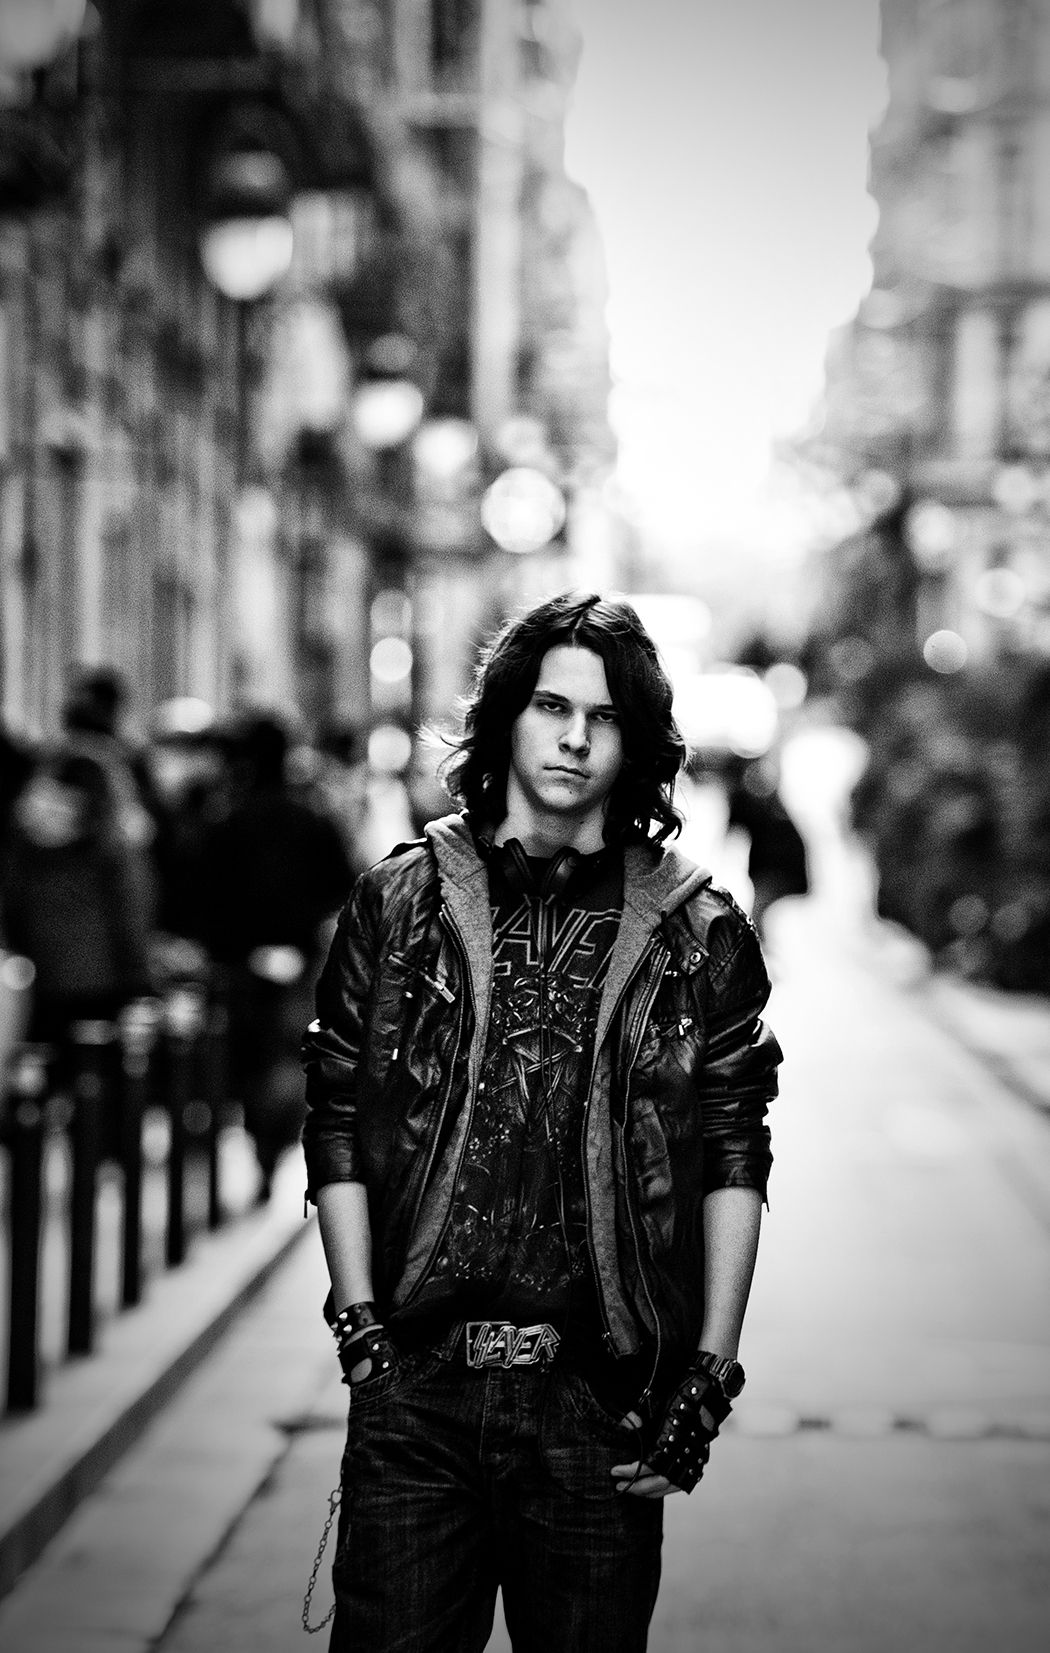 Pin by Kat Gray on Men's Style | Grunge boy, Fashion ...